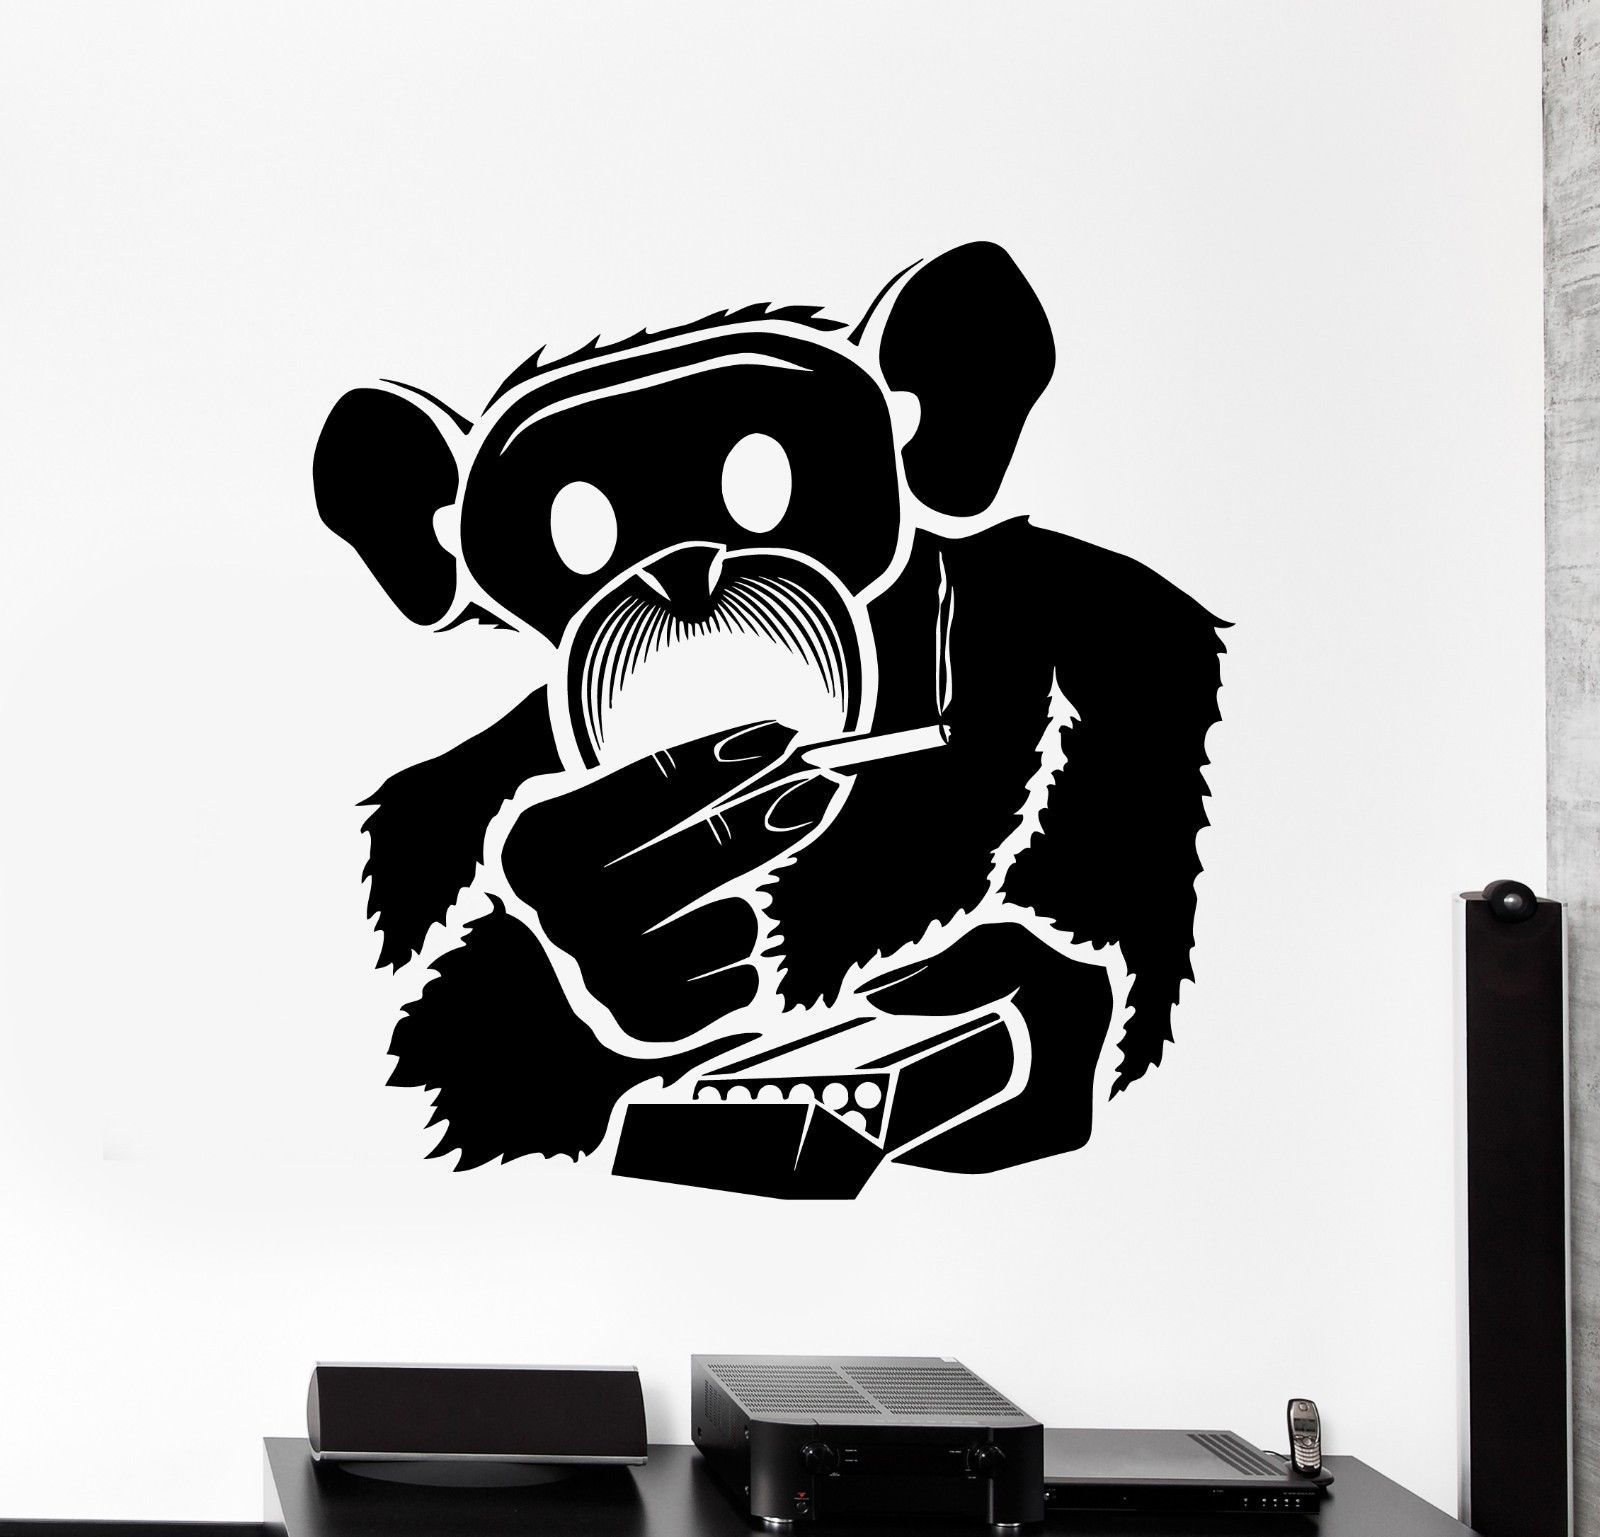 Wall Vinyl Marihuana Funny Monkey Smoking Weed Decal